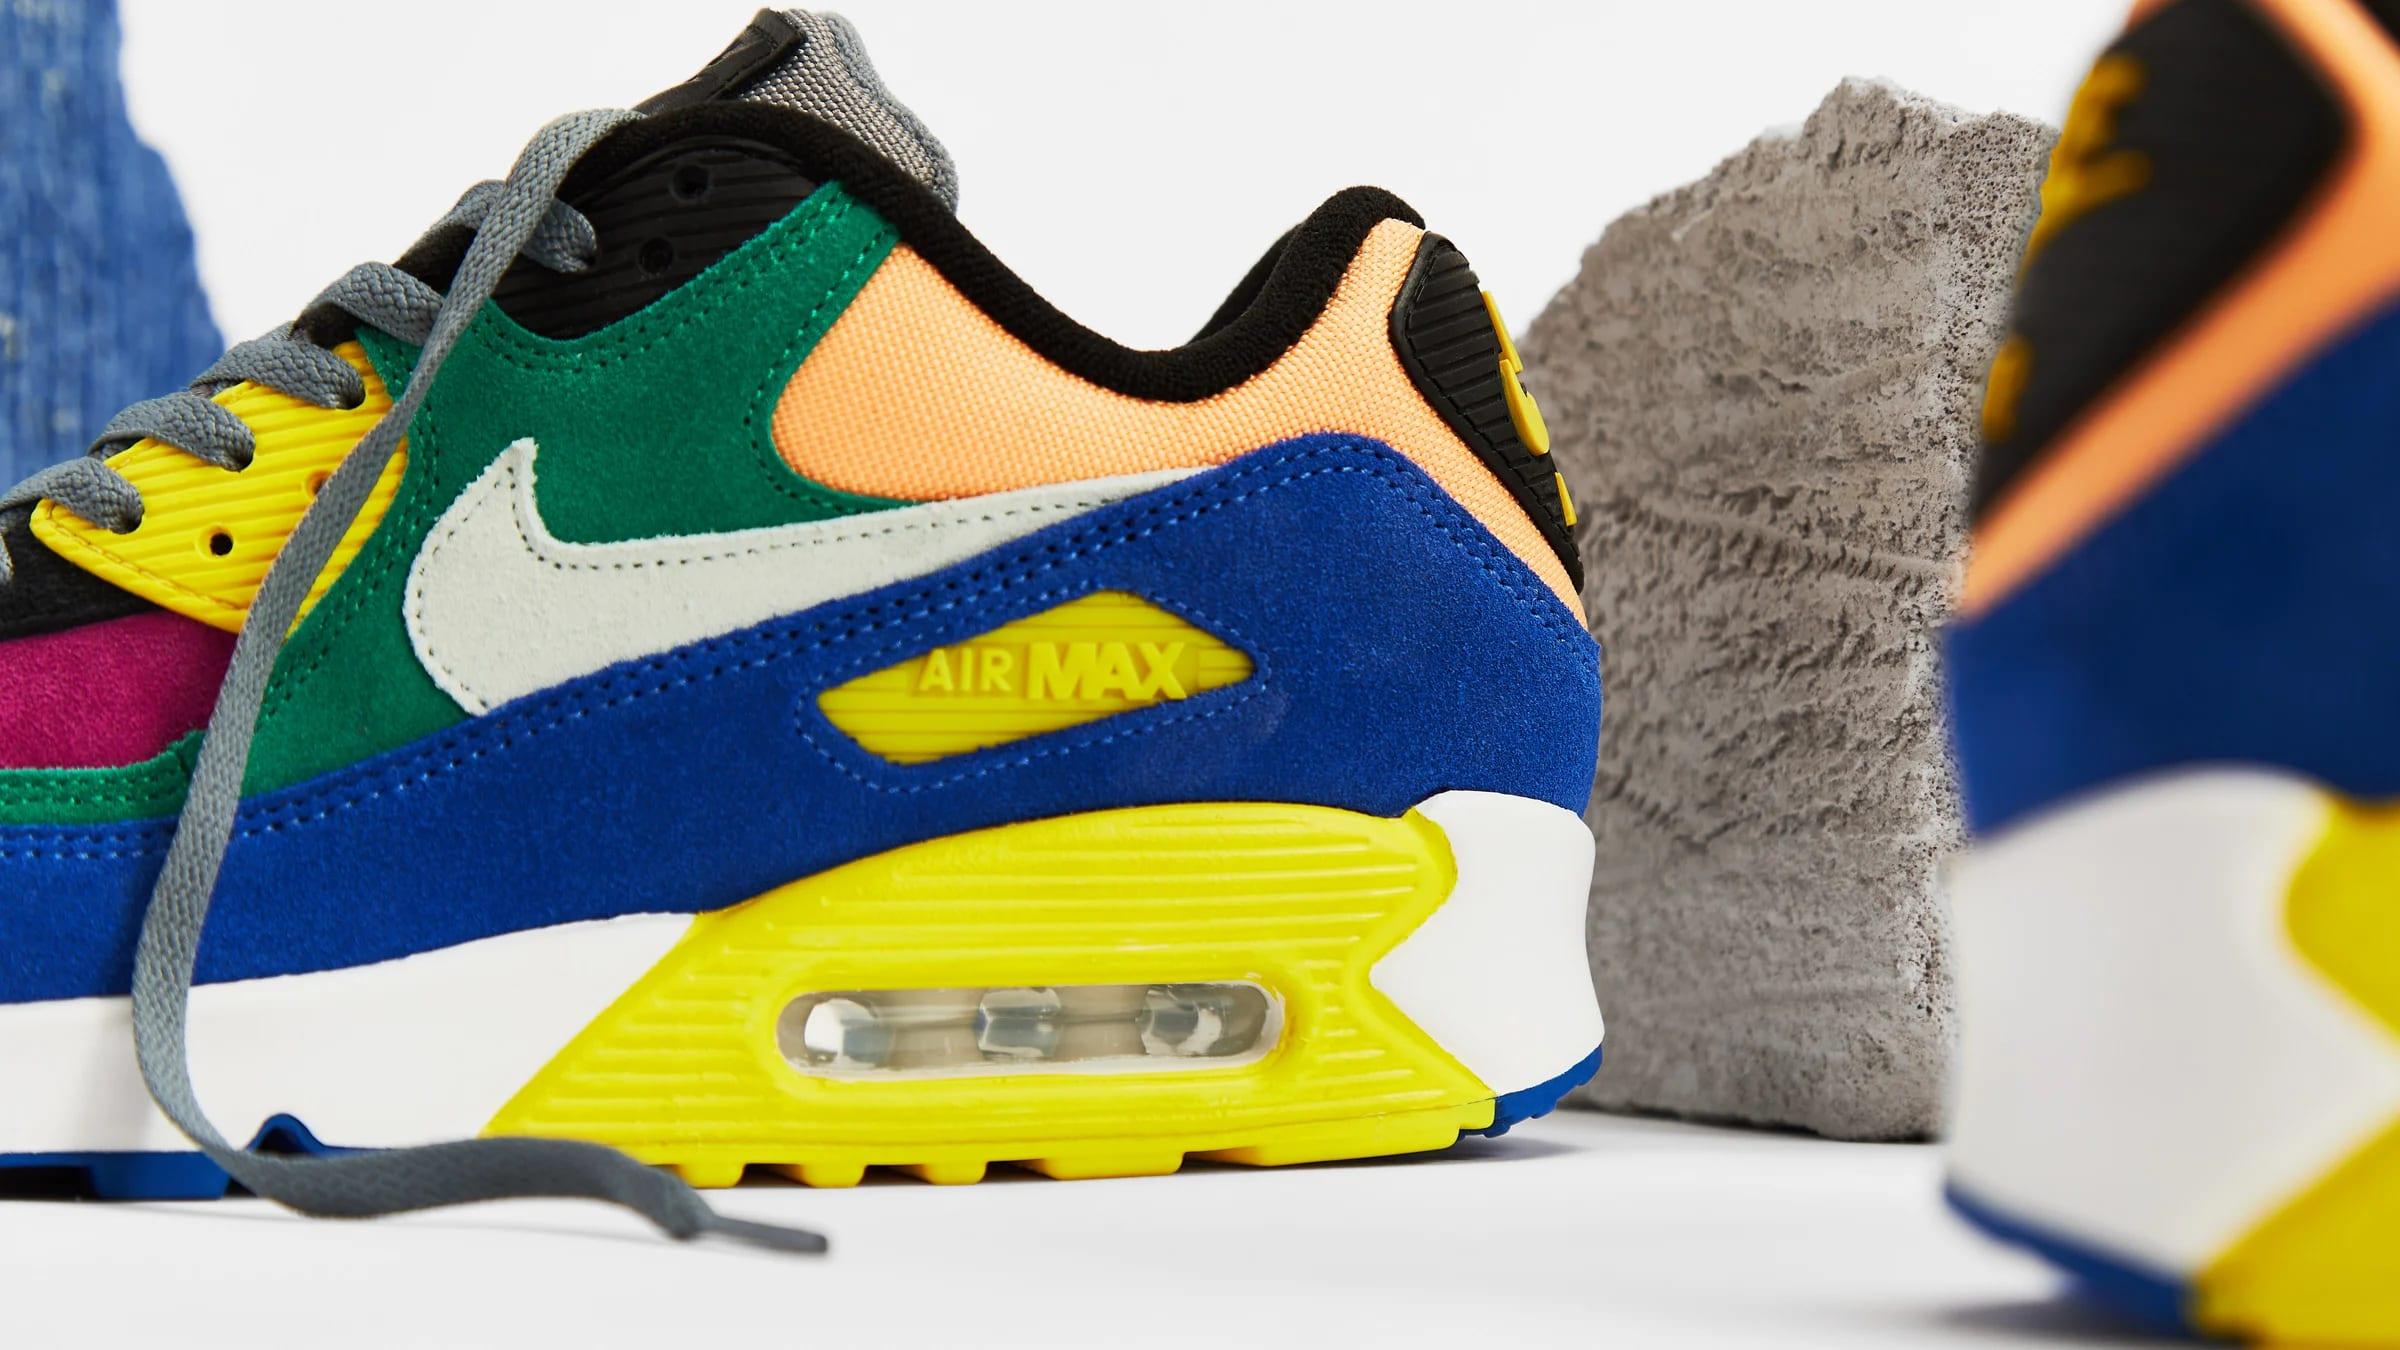 Nike Air Max 90 'Viotech 2.0' CD0917-300 3